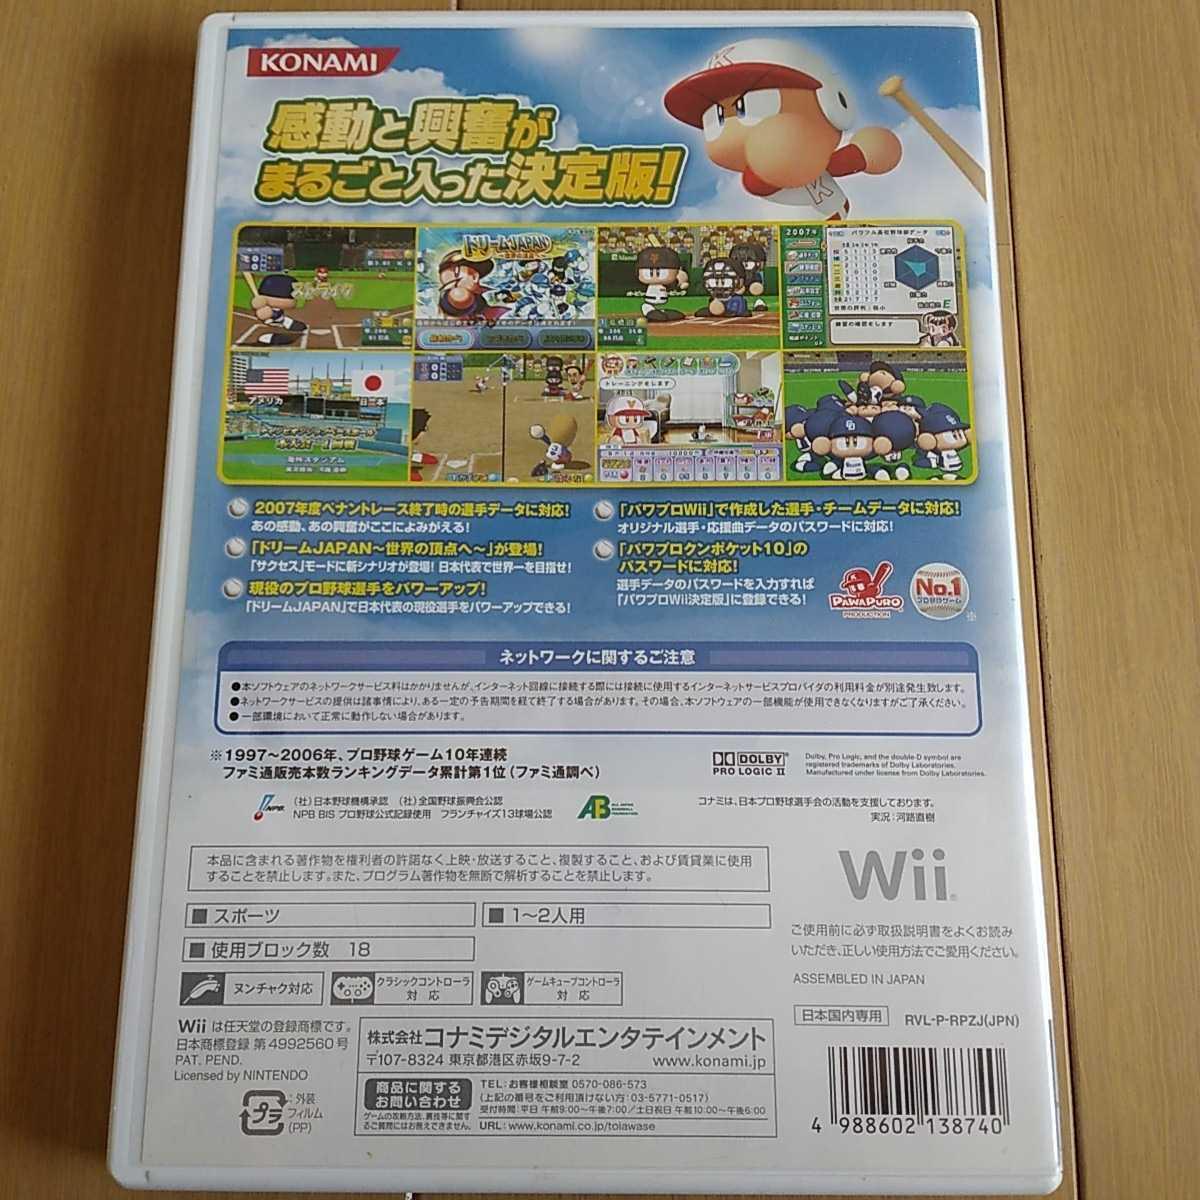 Wii 実況 パワフル プロ野球 Wii 決定版 中古 動作確認済